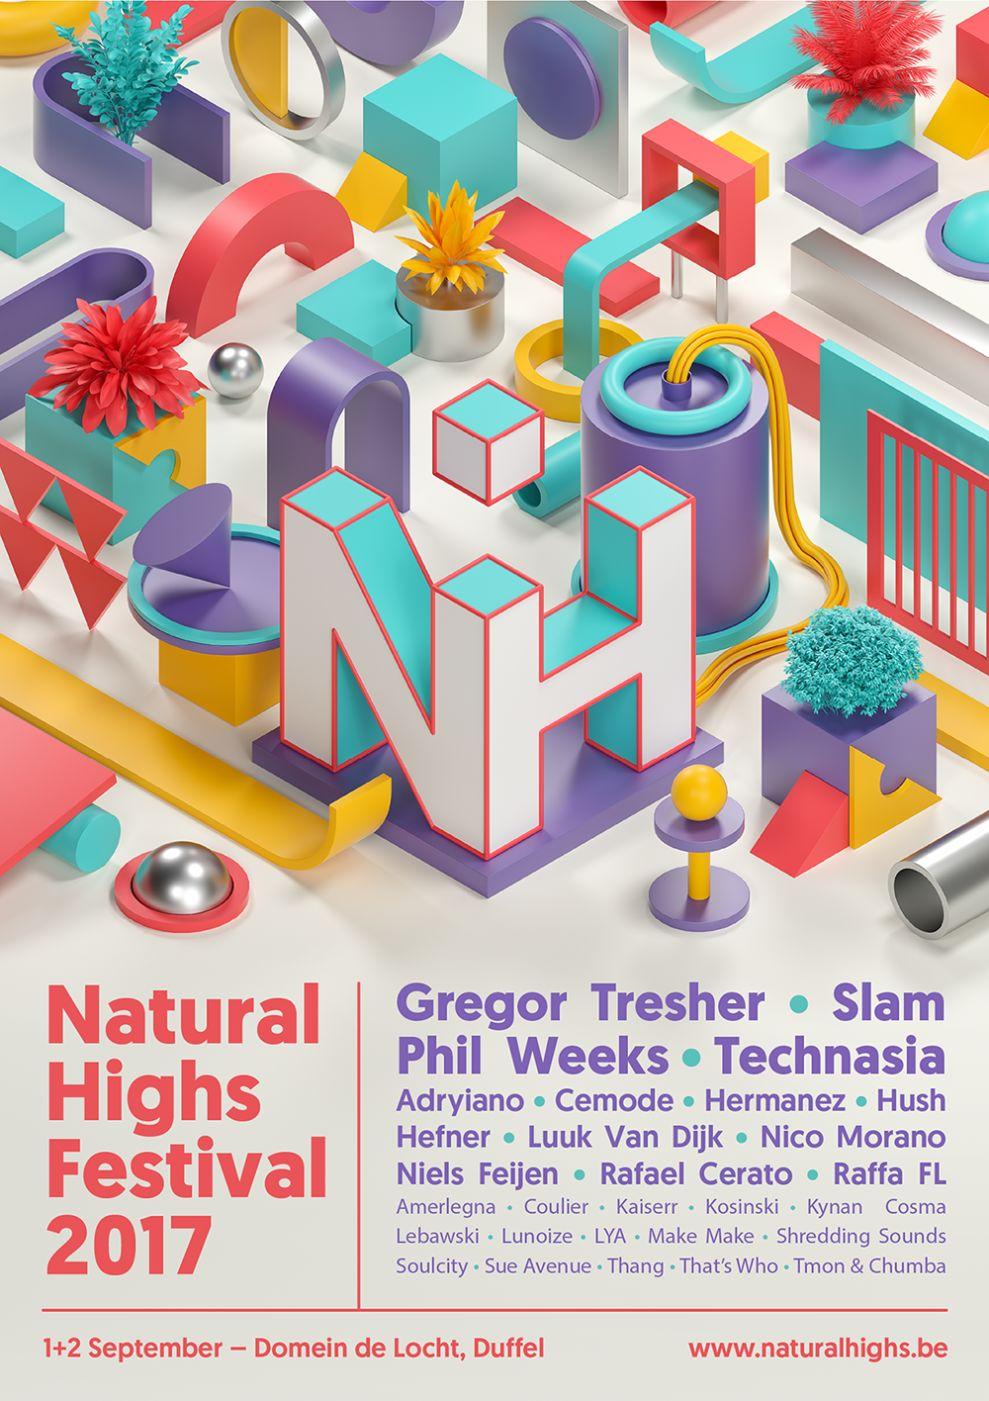 Natural Highs Festival 2017 Creative Print Design